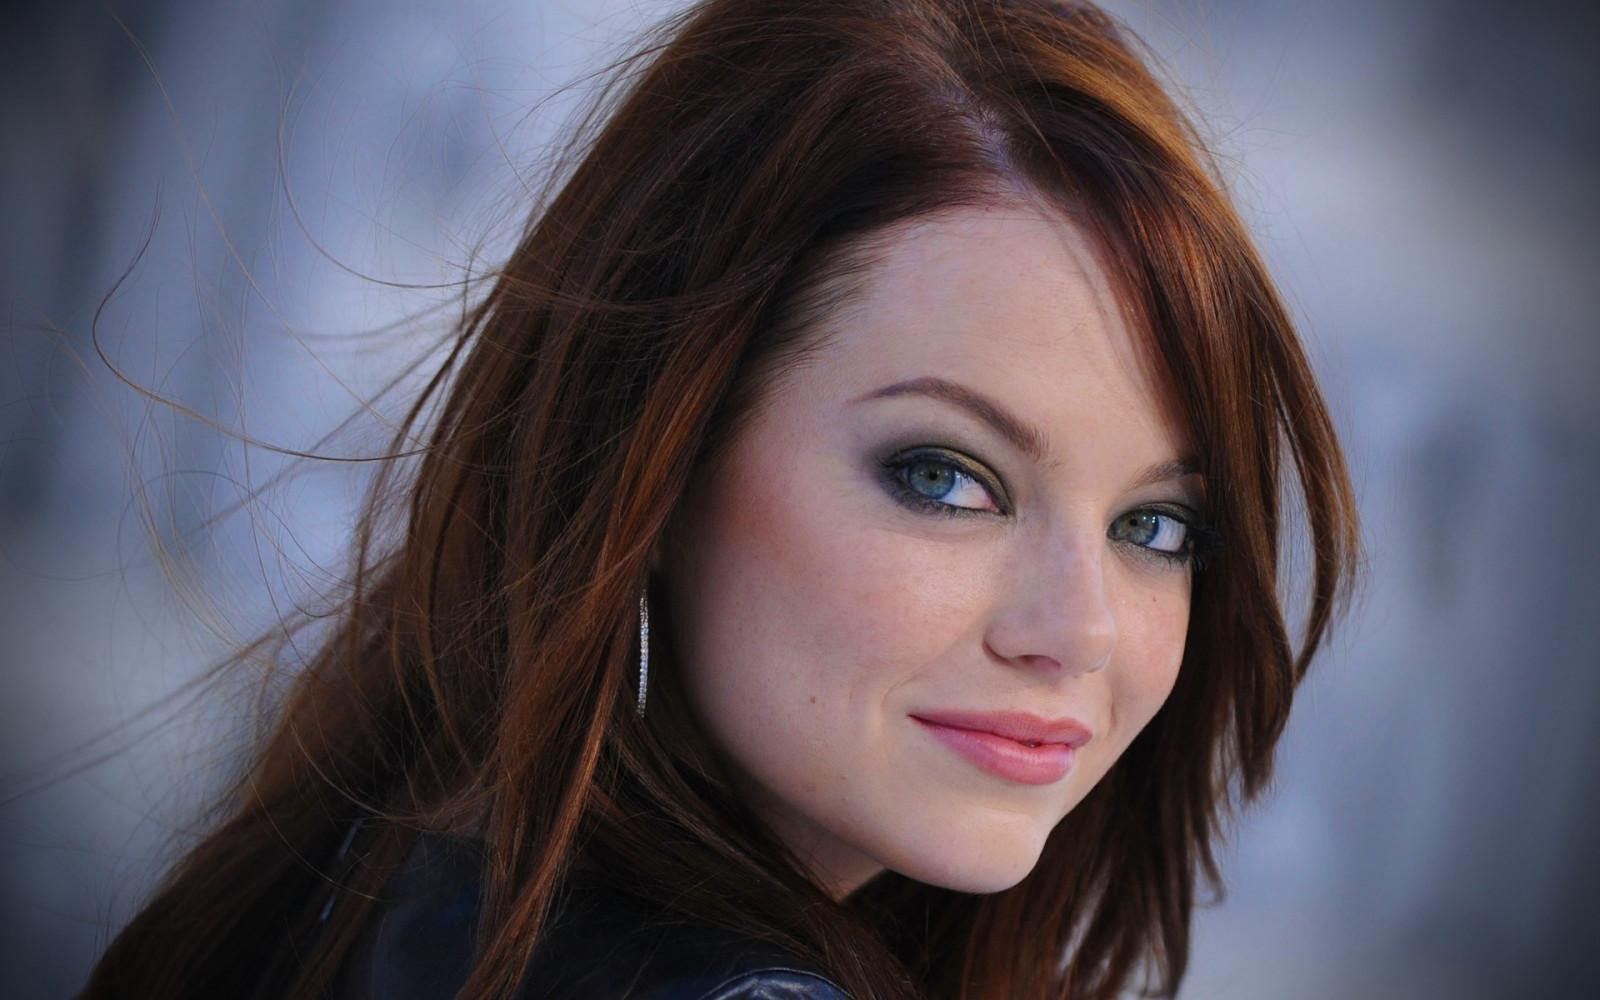 Wallpaper  Face, Women, Redhead, Long Hair, Looking At -6350